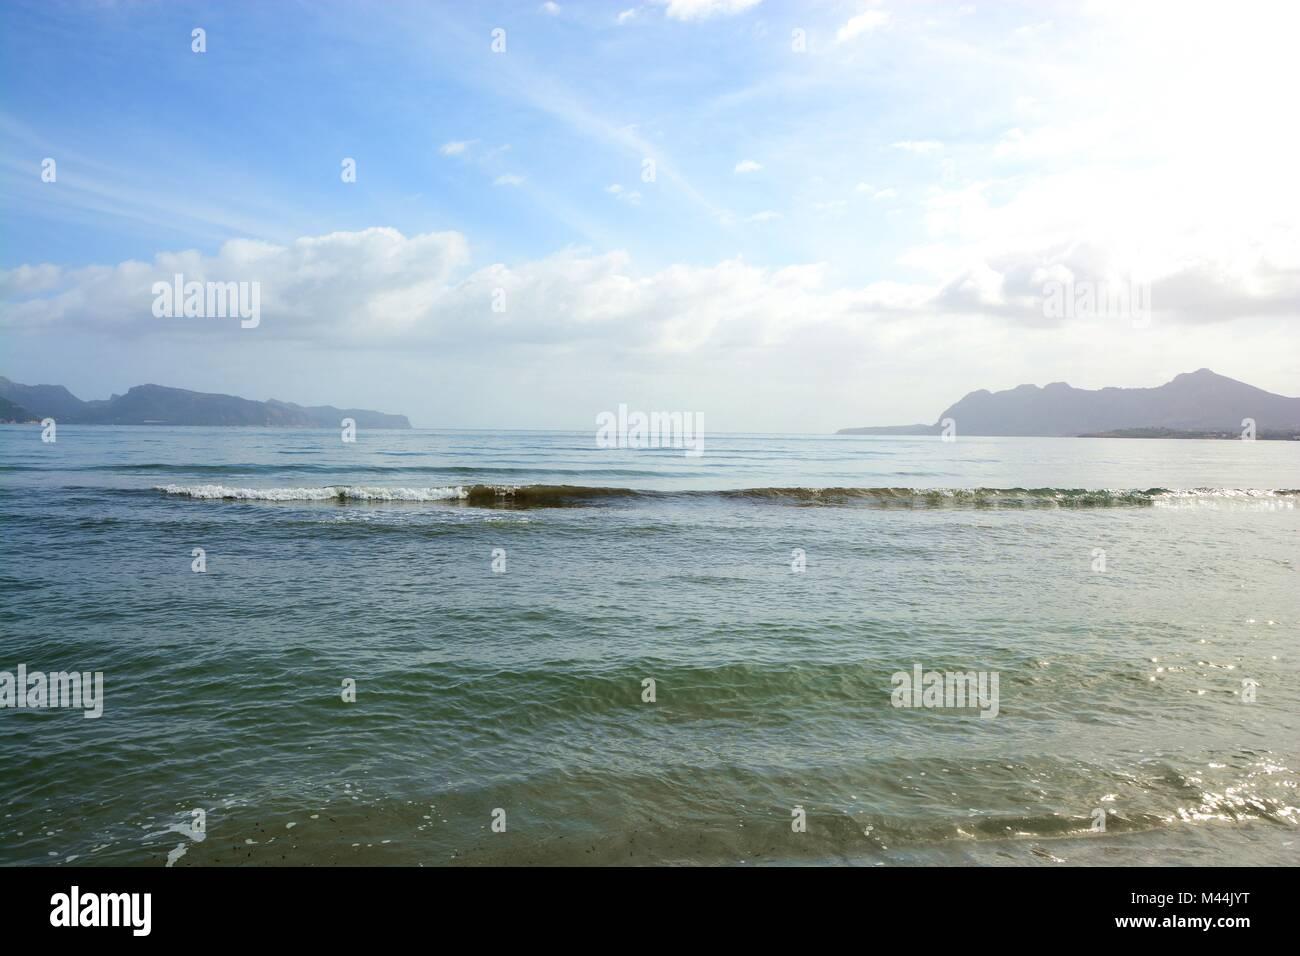 mediterranian sea - Stock Image